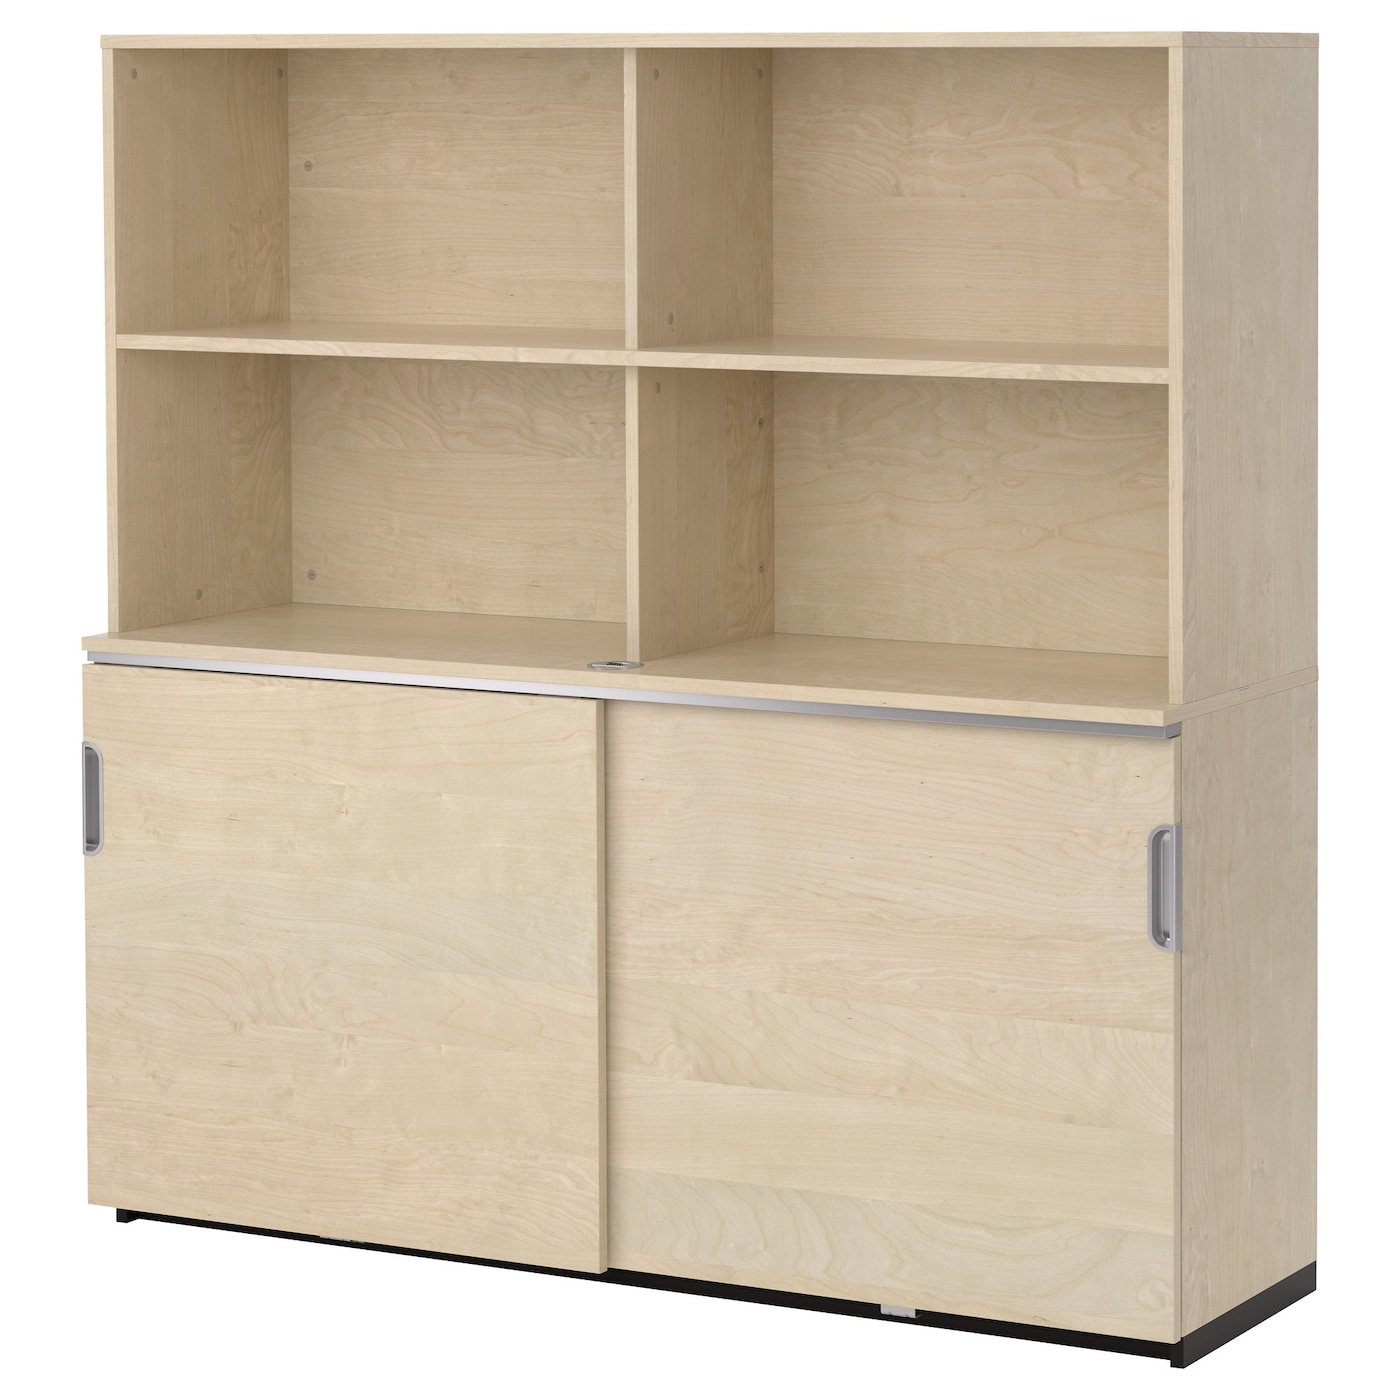 Meuble rangement papier ikea tagres ikea kallax en ides for Ikea meuble rangement